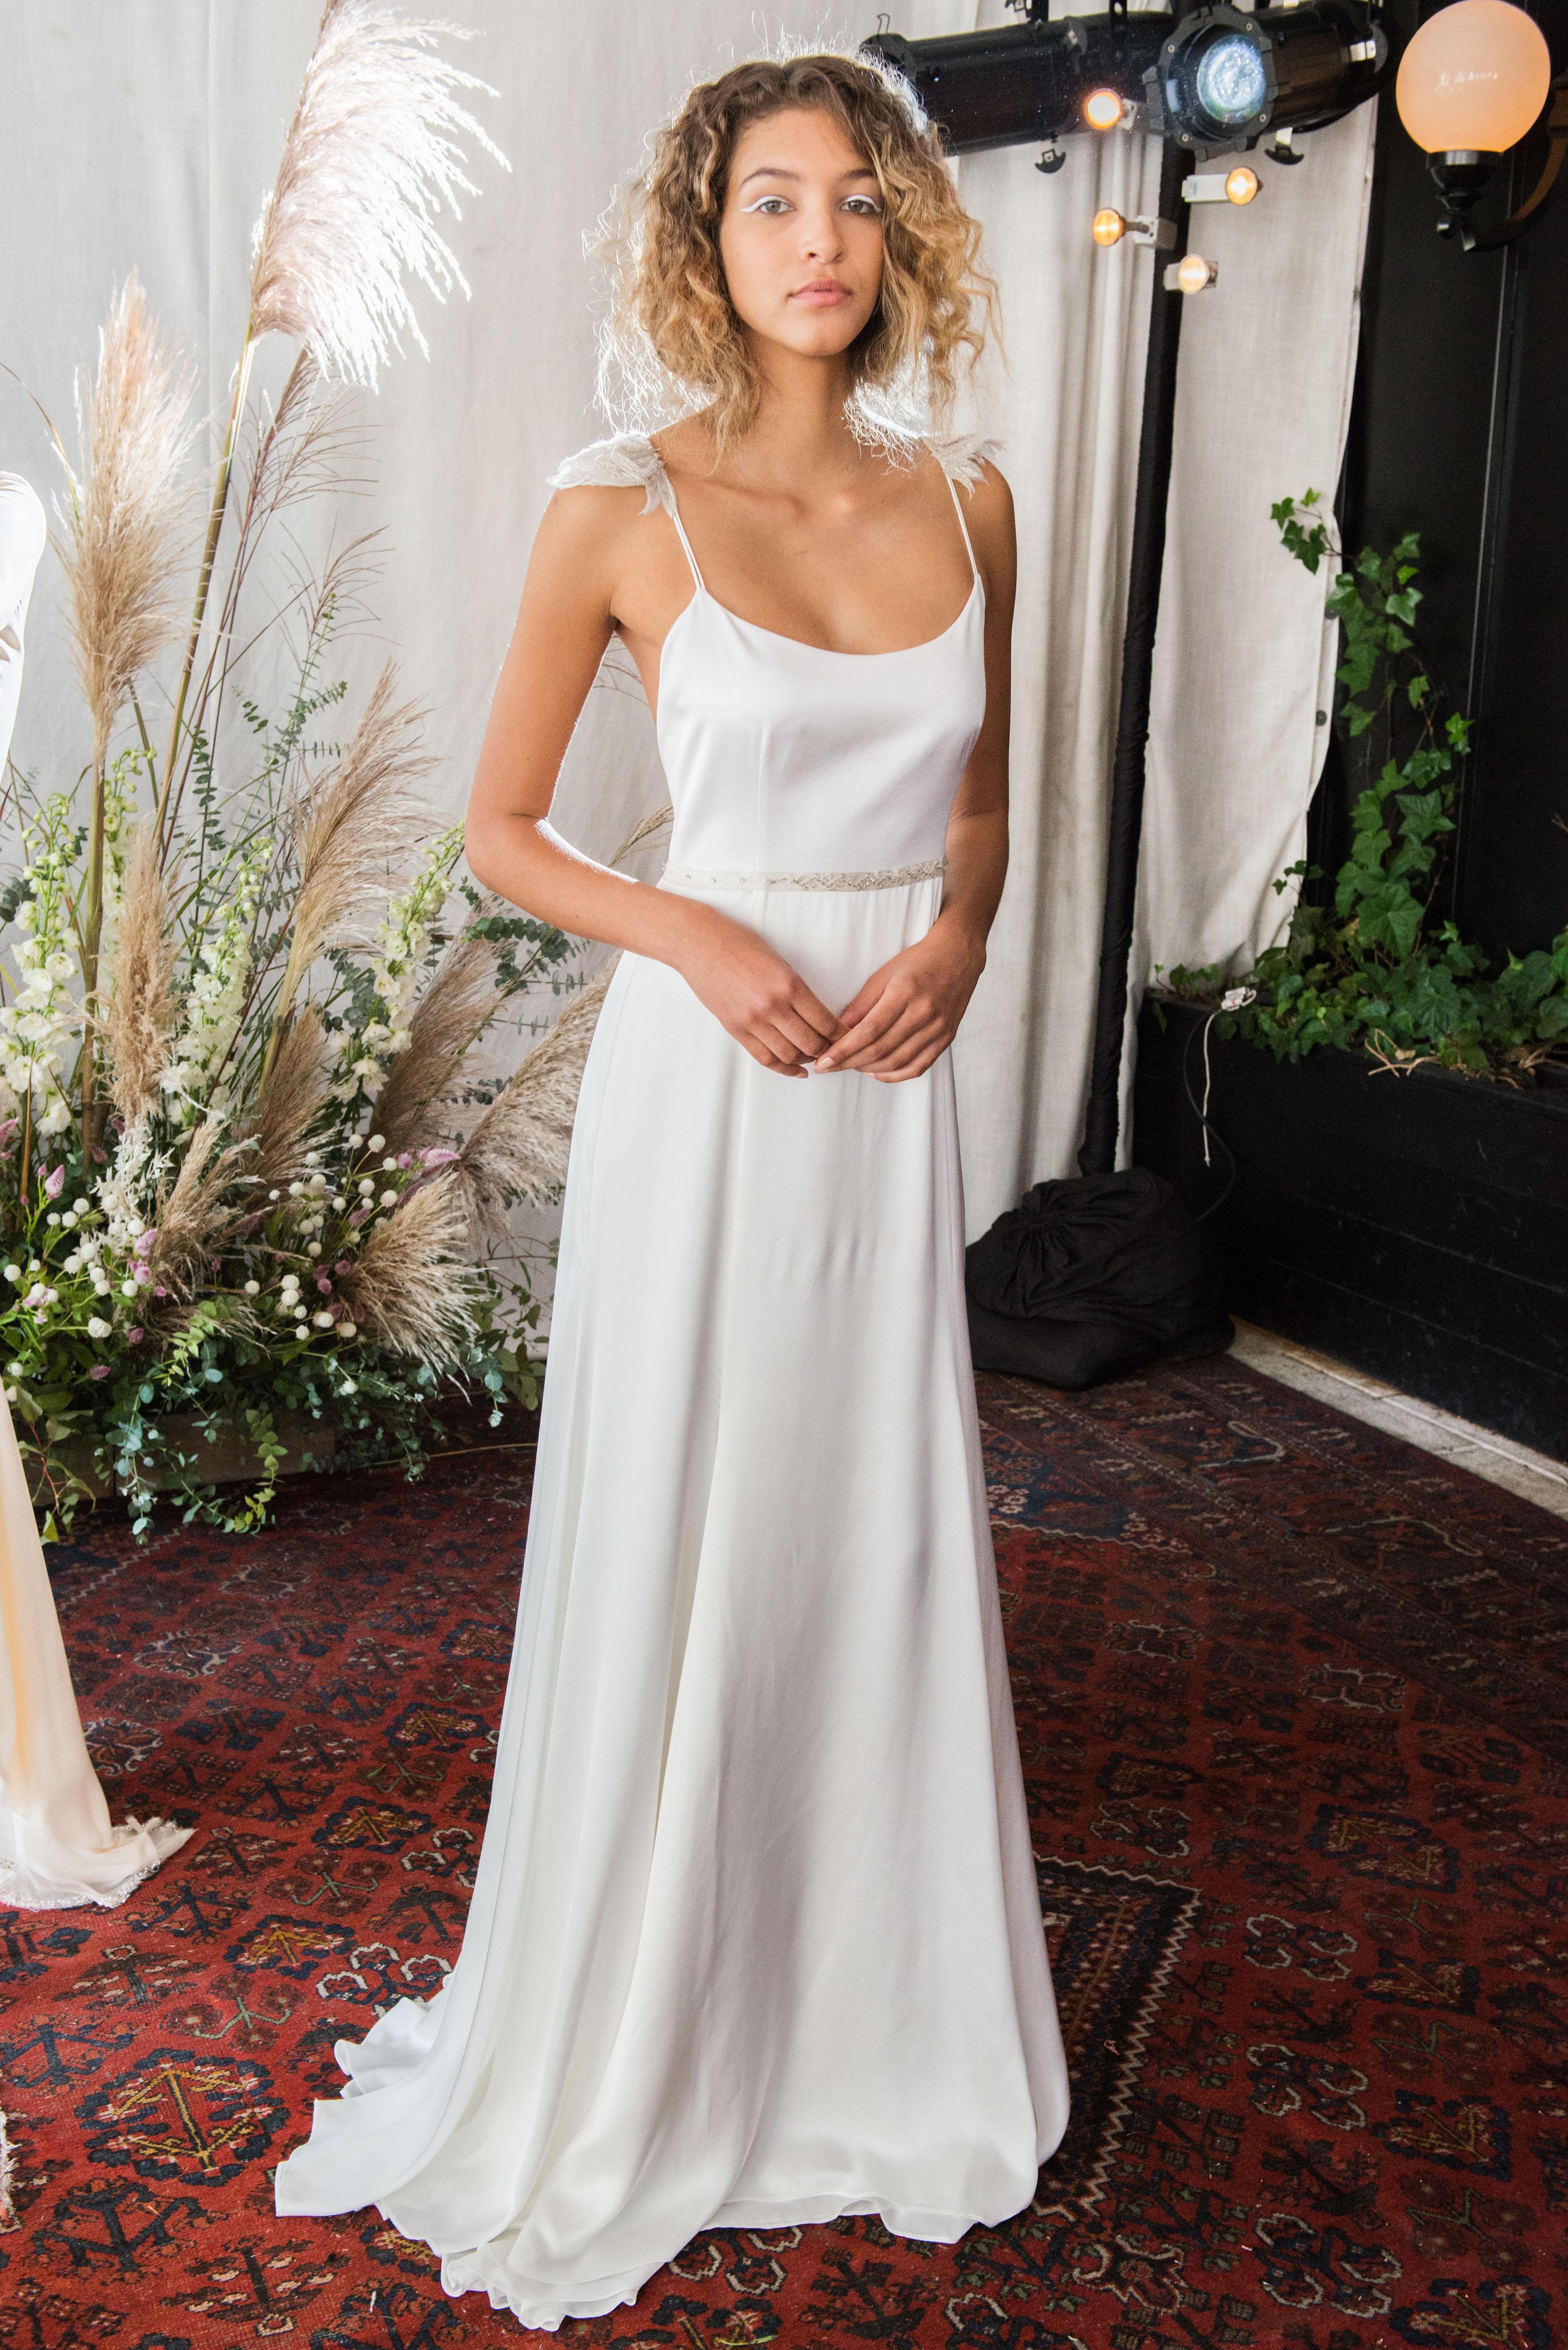 alexandra grecco wedding dress fall 2018 spaghetti straps a-line cap sleeves